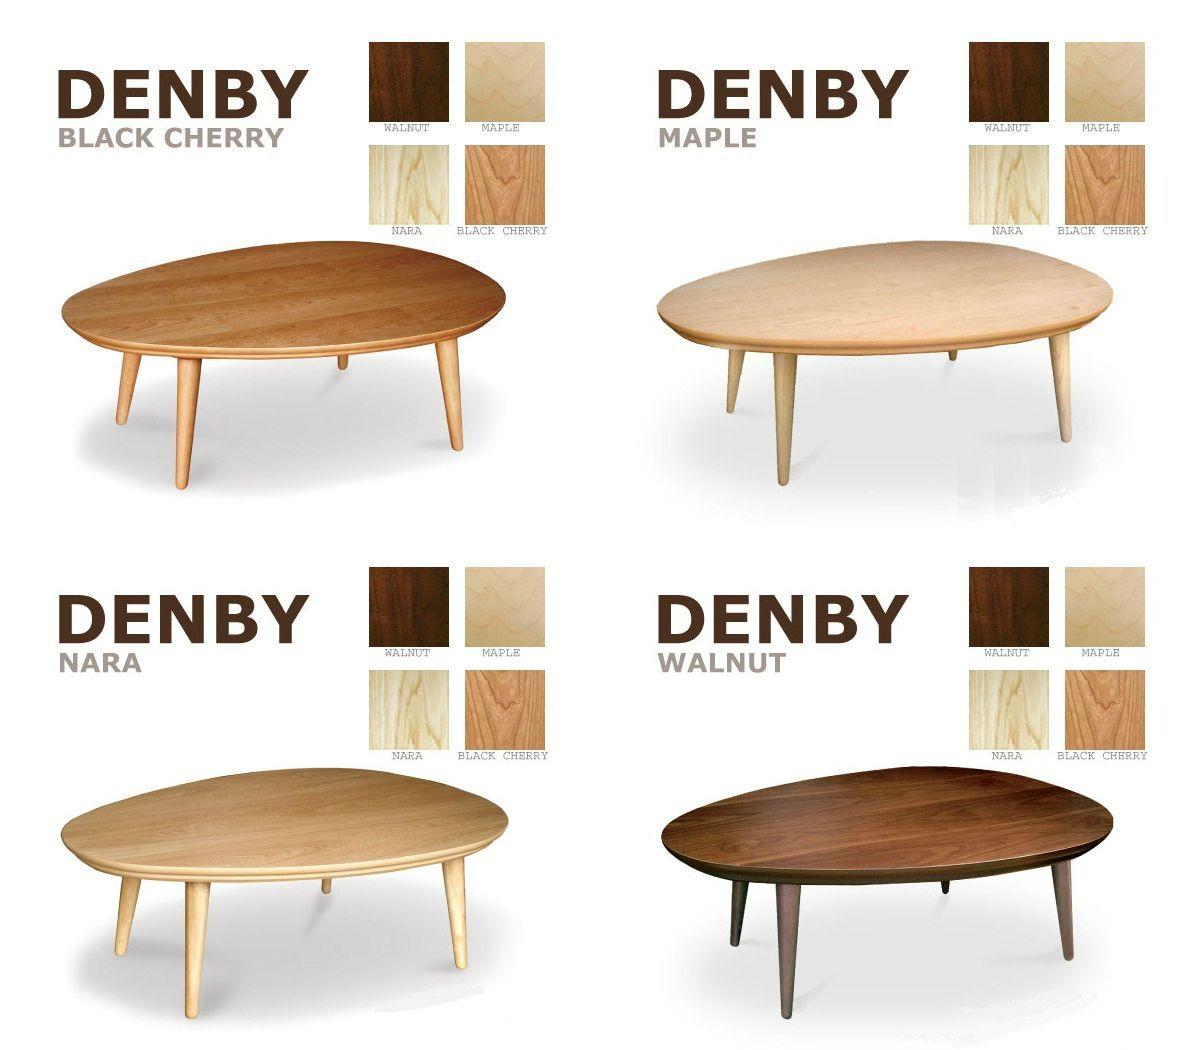 110cm×80cmタイプ 【デンビー】 4色対応  暖卓機能付フロアテーブル お洒落こたつ リビングテーブル ローテーブル